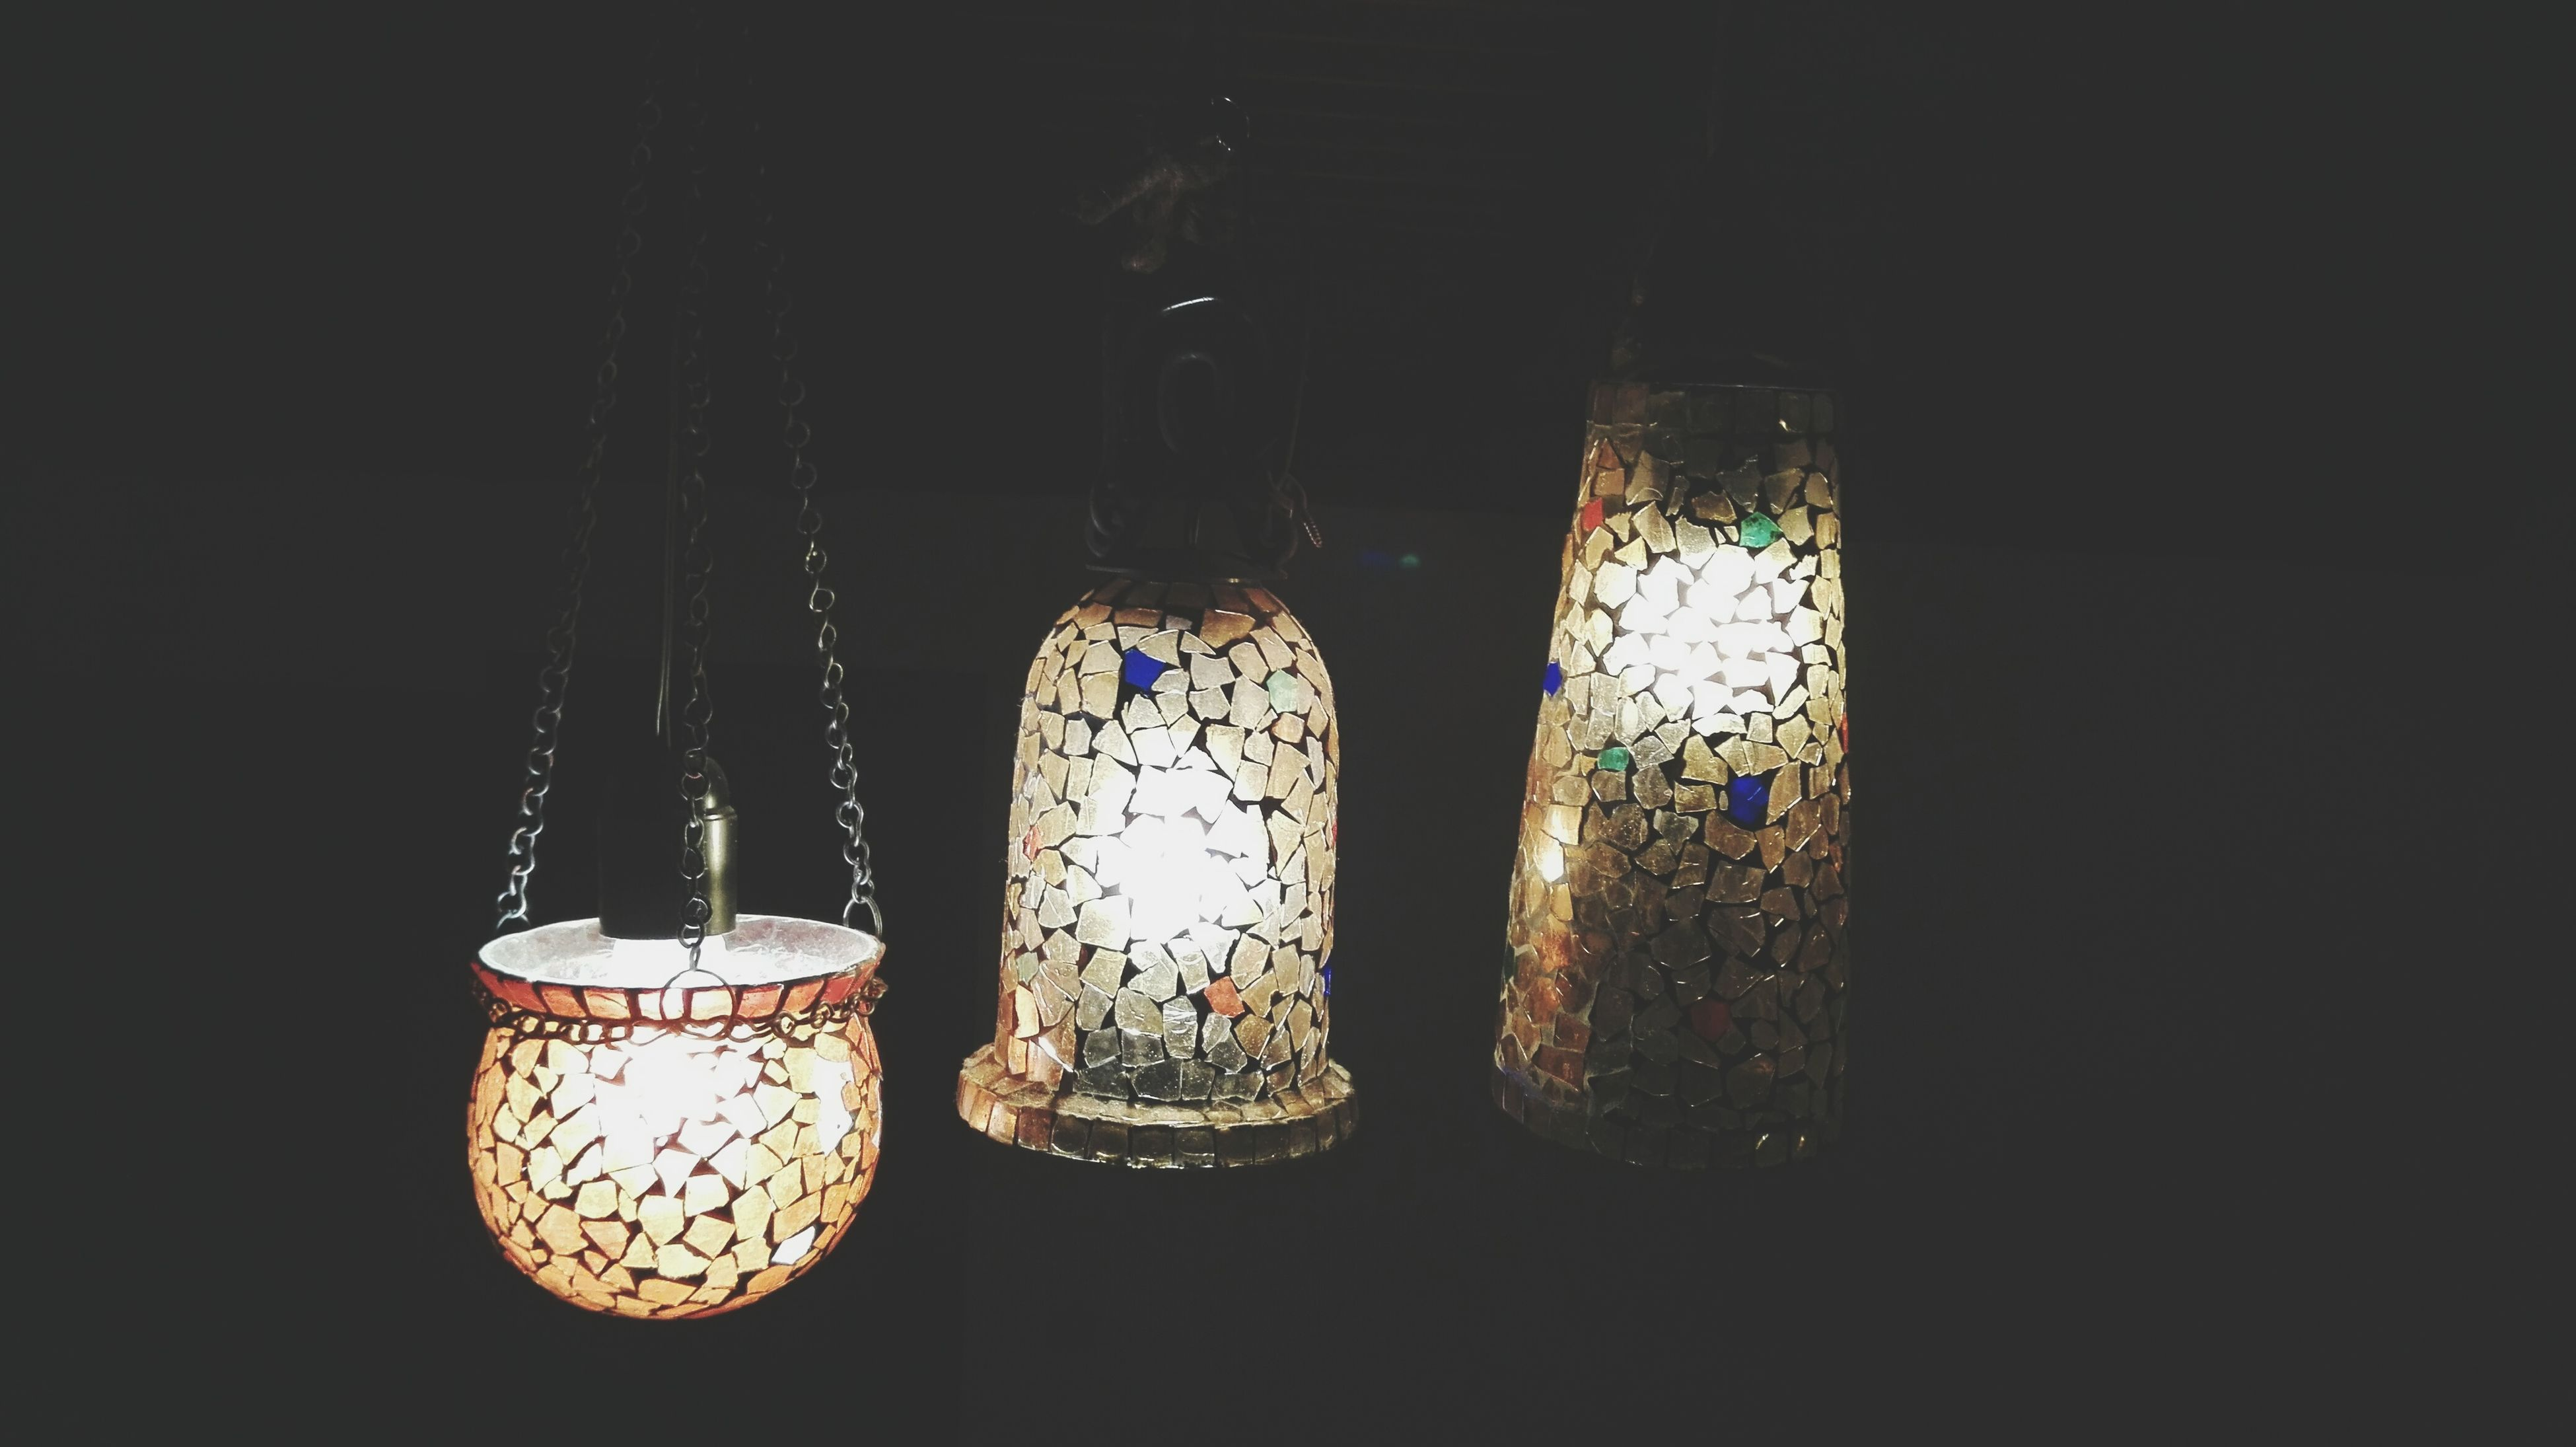 illuminated, lighting equipment, indoors, hanging, night, glass - material, reflection, window, close-up, transparent, electricity, dark, decoration, no people, light bulb, electric light, metal, light - natural phenomenon, glowing, lantern